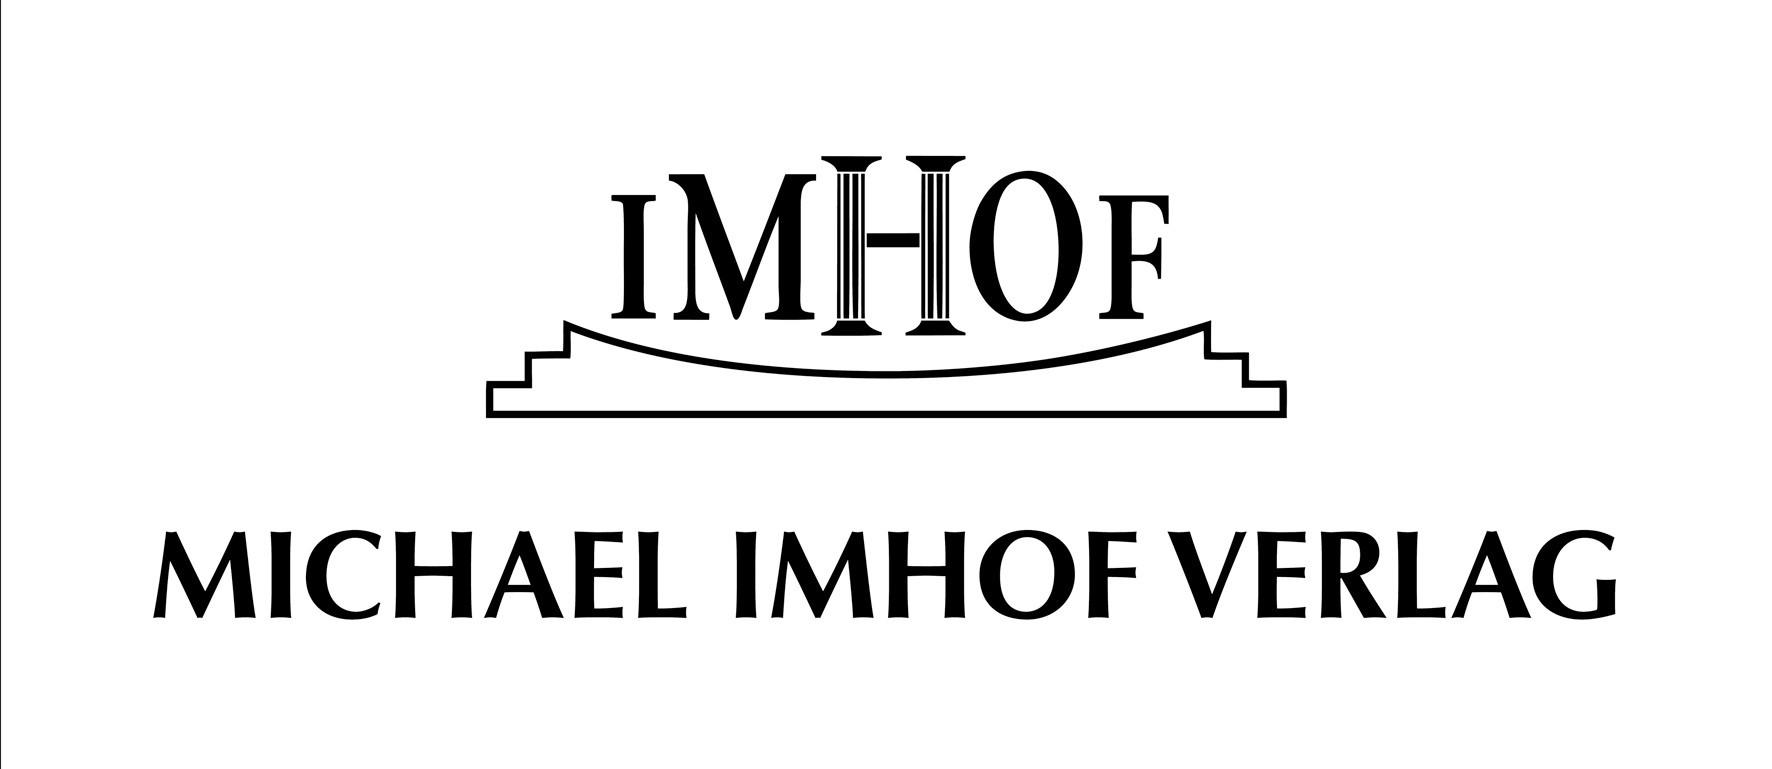 Michael Imhof Verlag